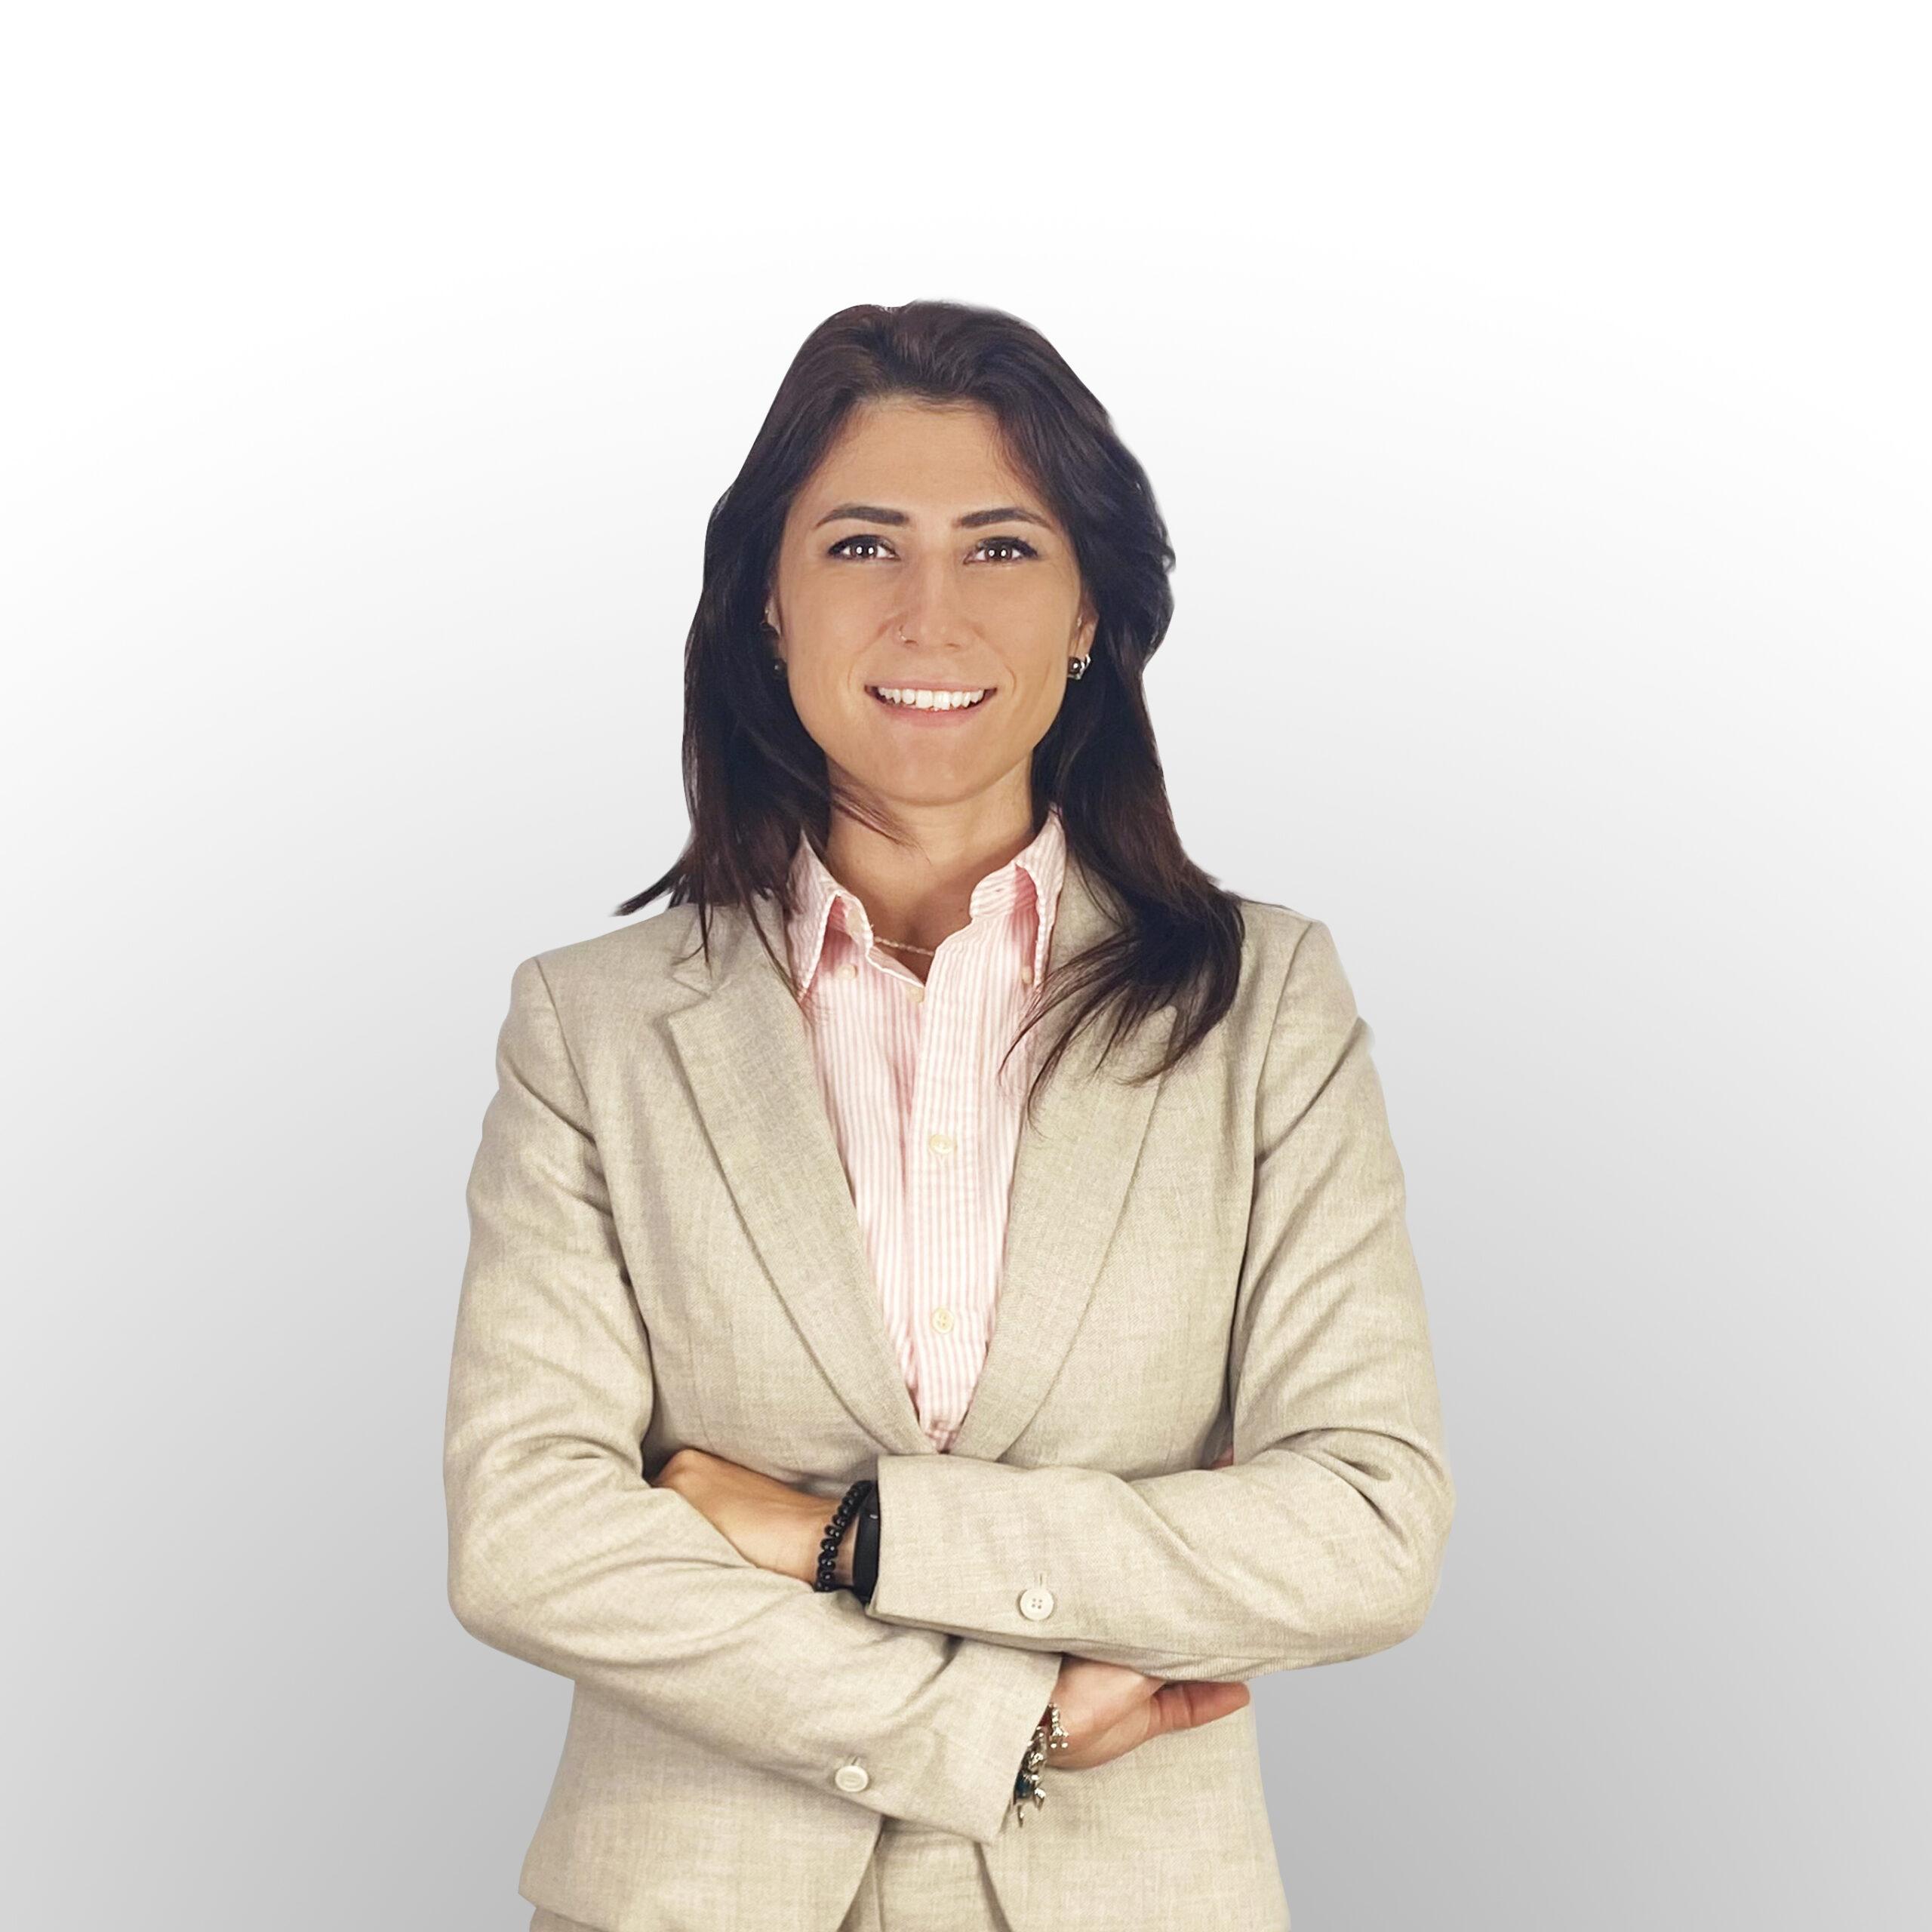 Giorgia Beltrami